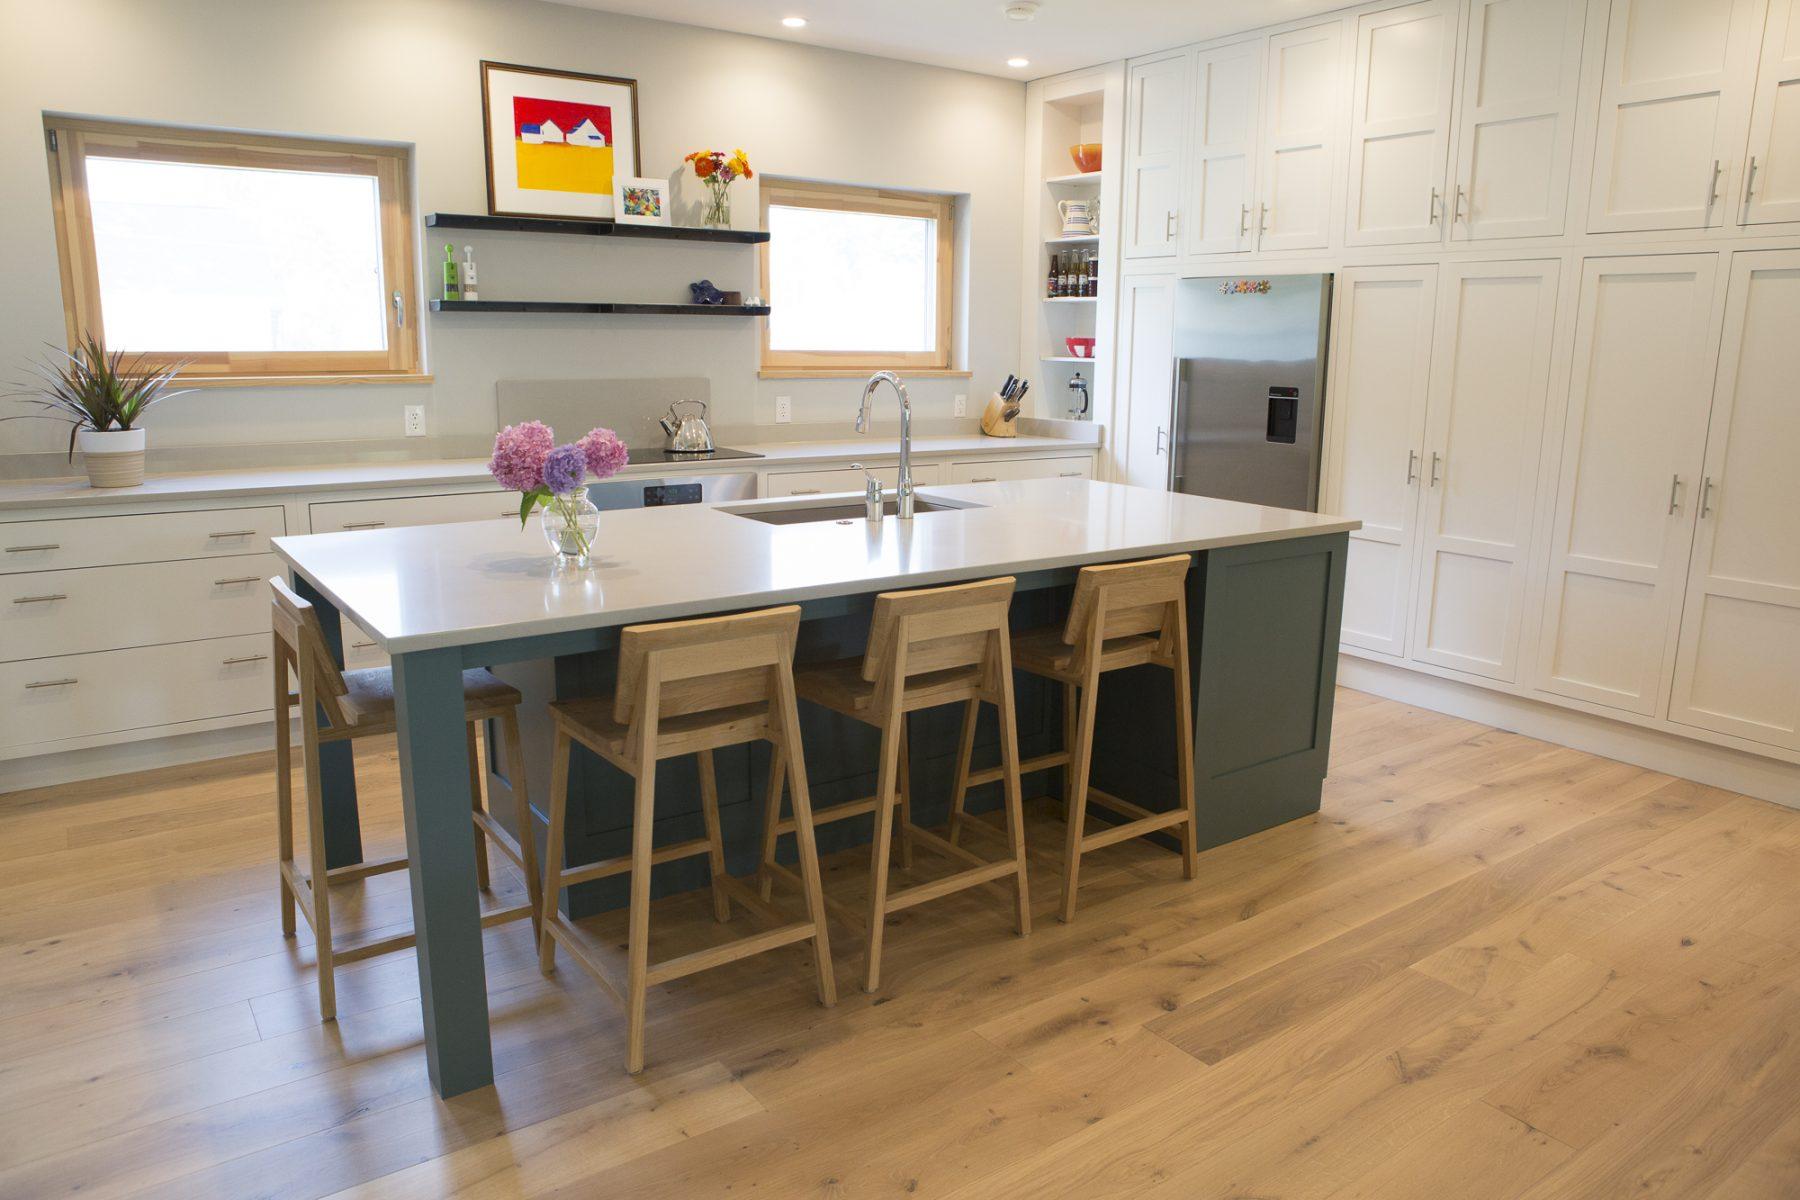 architecture-interior-design-photography-cedar-street-builders-zionsvile-30